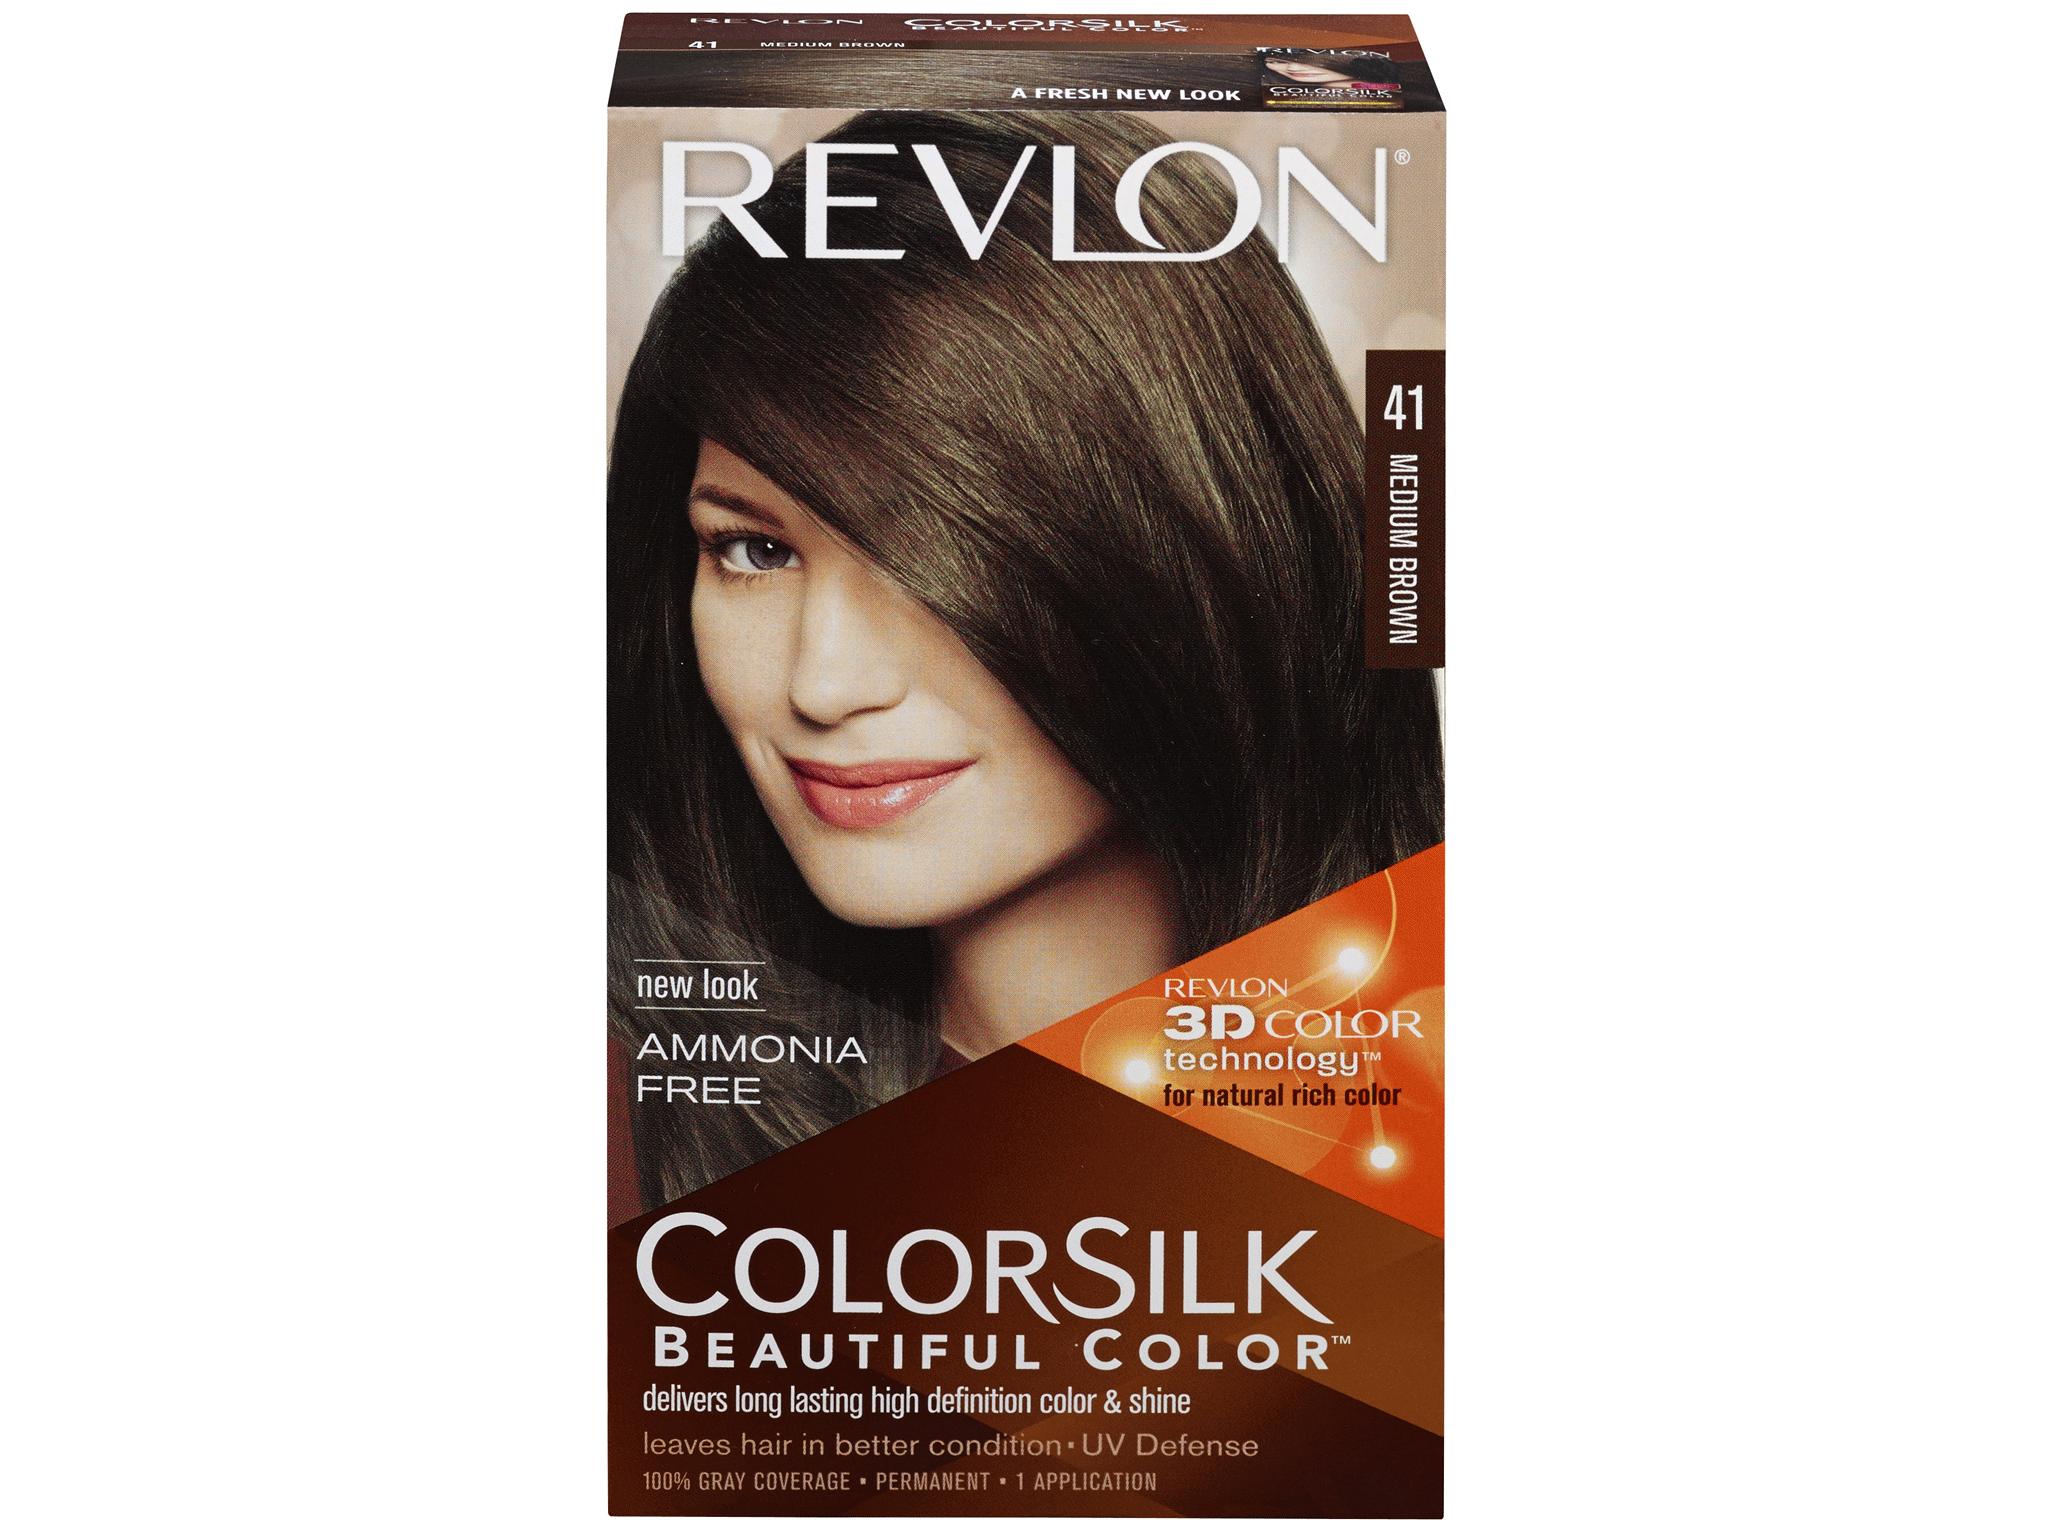 Revlon Color Silk Medium Brown 41 1 Application Meijer